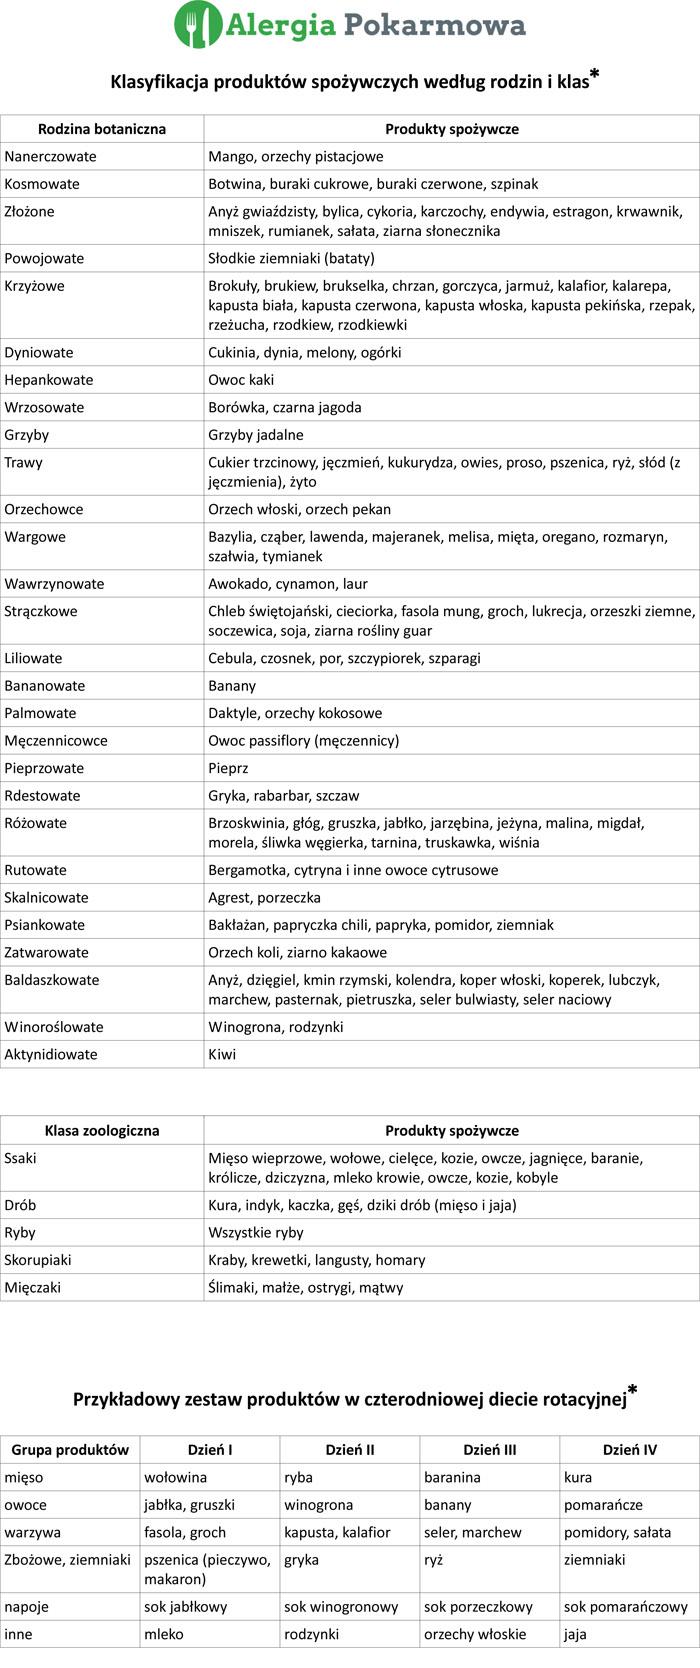 tabelka_dieta_rotacyjna